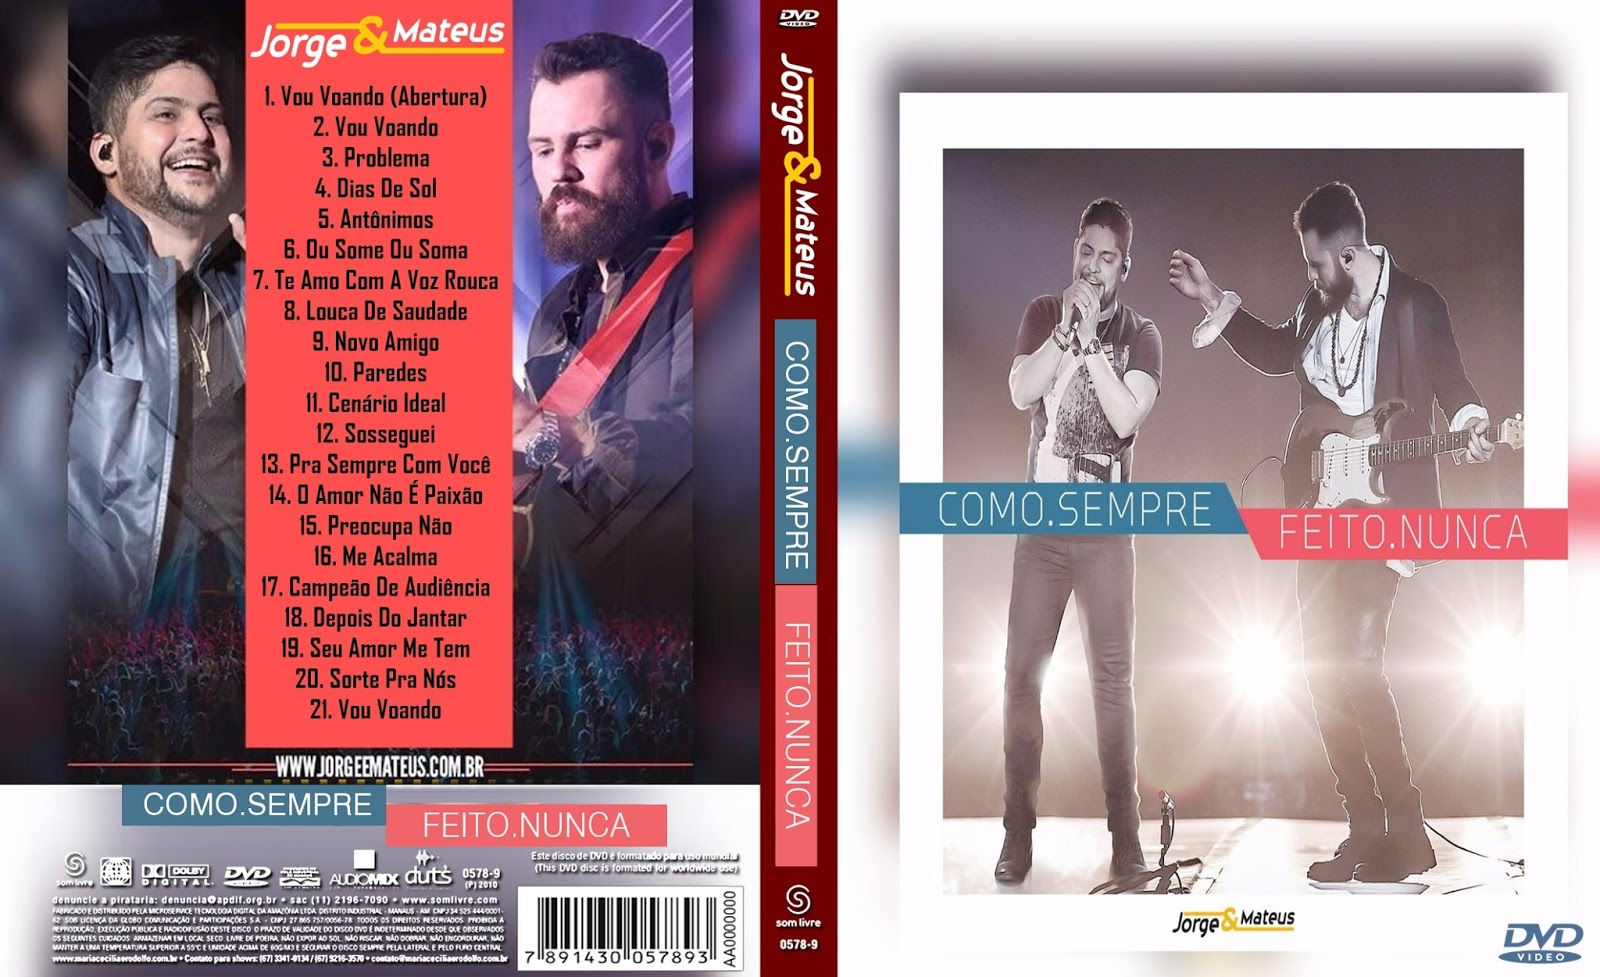 Jorge & Mateus Como Sempre Feito Nunca DVDRip XviD 2016 Jorge 2B 2526 2BMateus 2BComo 2BSempre 2BFeito 2BNunca 2BDVD 2B  2BXANDAODOWNLOAD